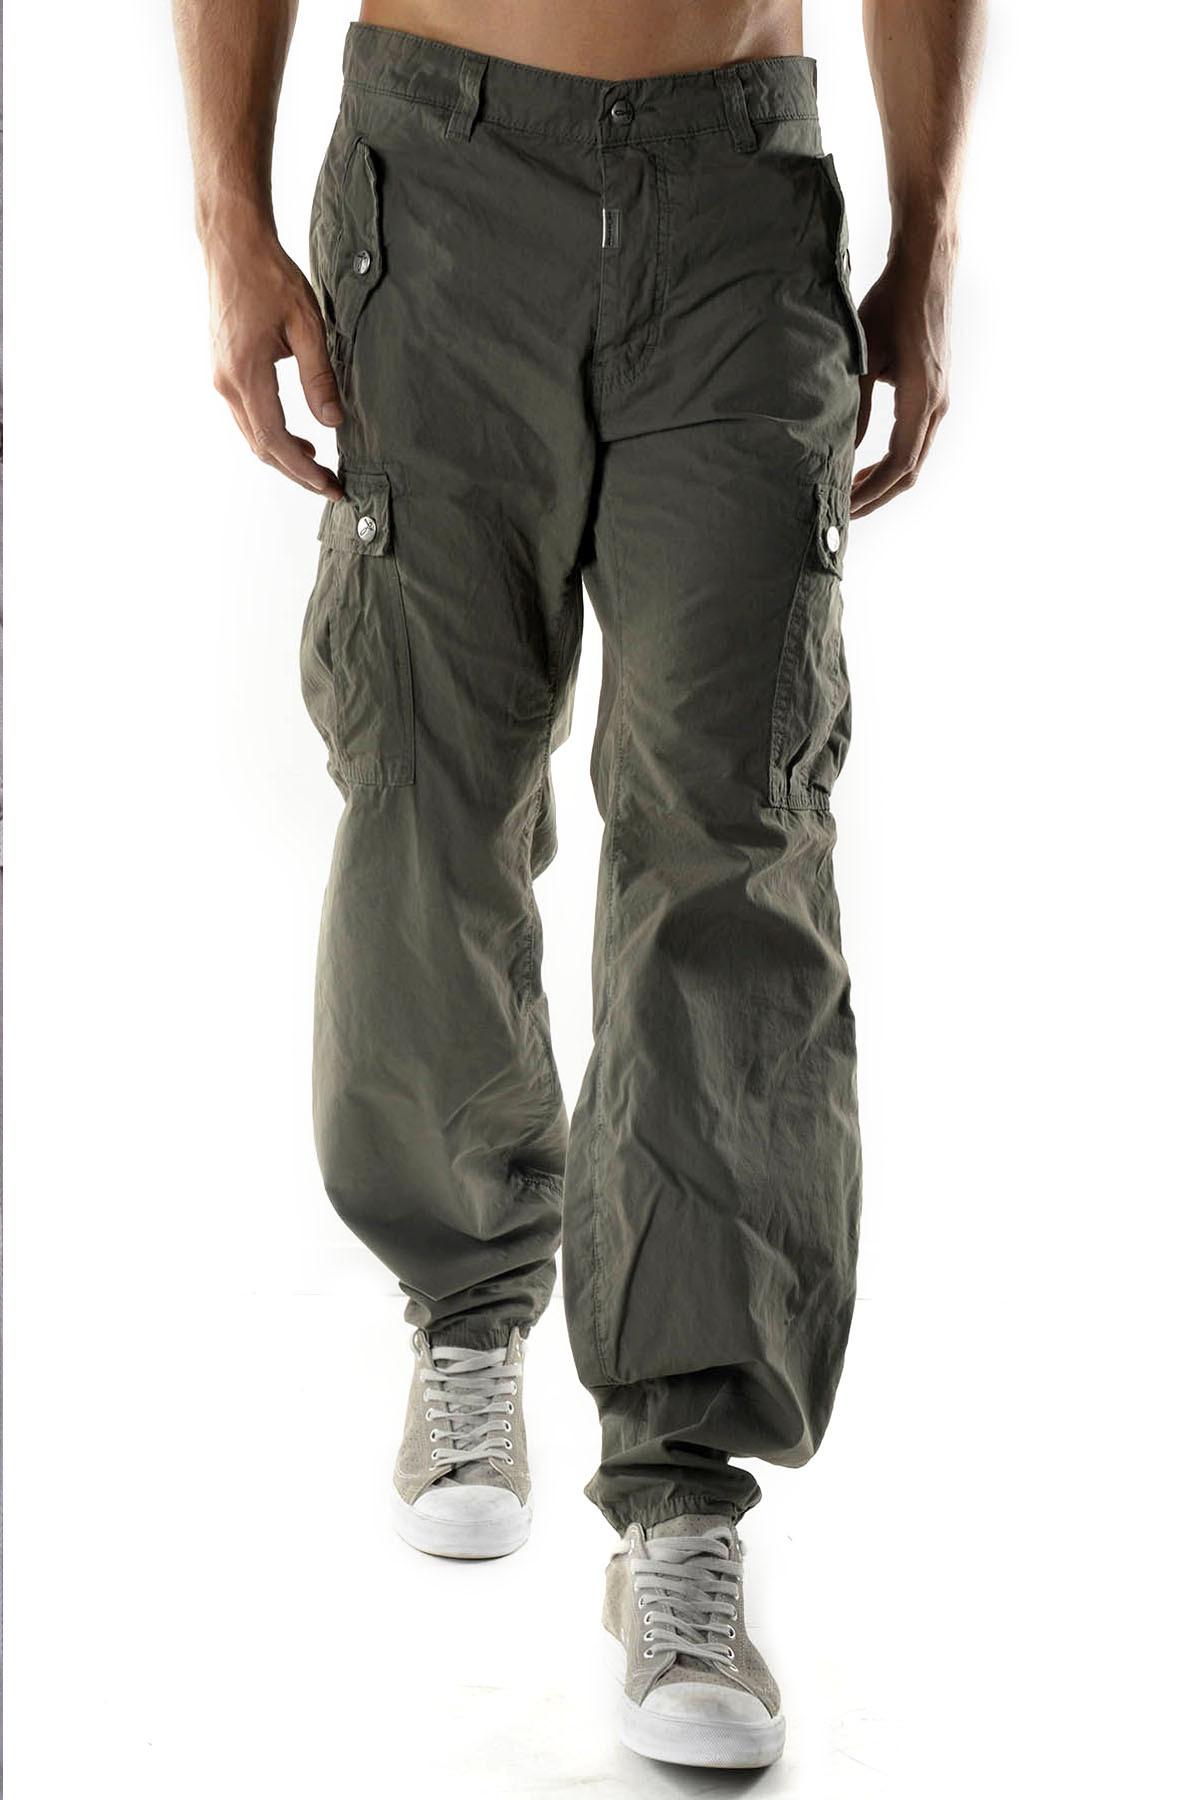 Marchio Absolut Joy Genere Uomo Tipologia Pantaloni Stagione Tutte le stagi…